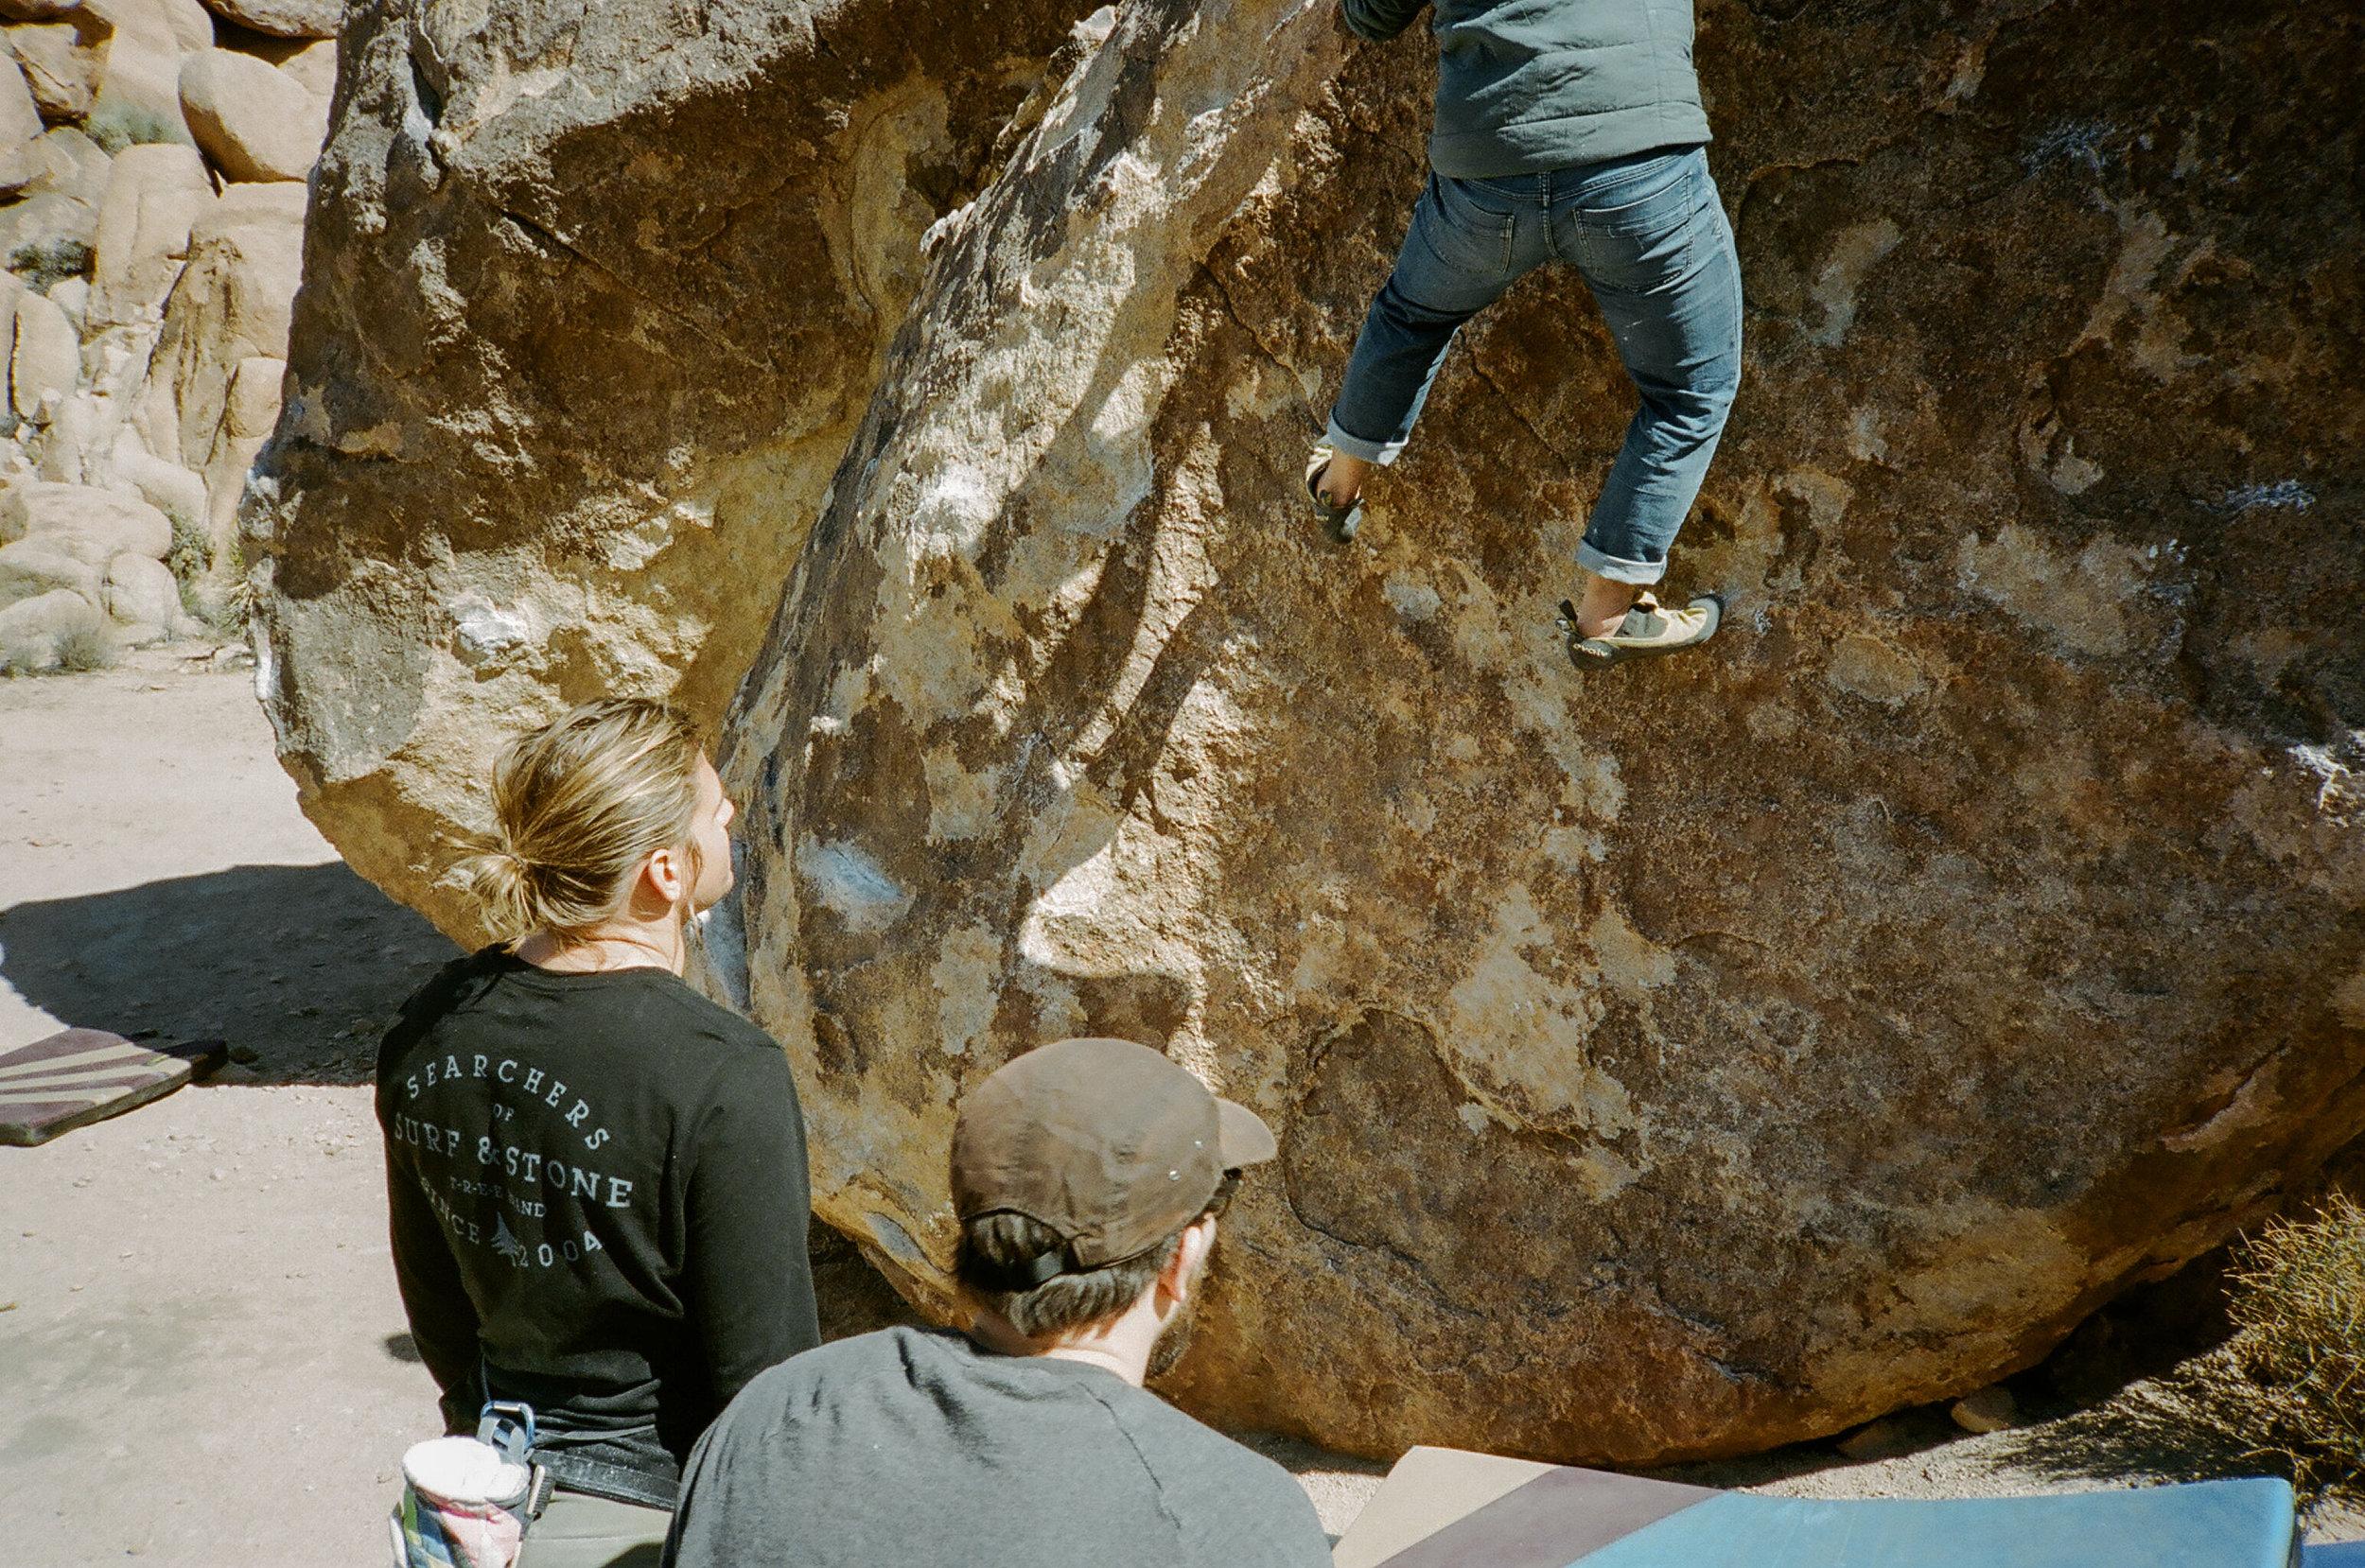 Seabass and Caleb spotting Shawn